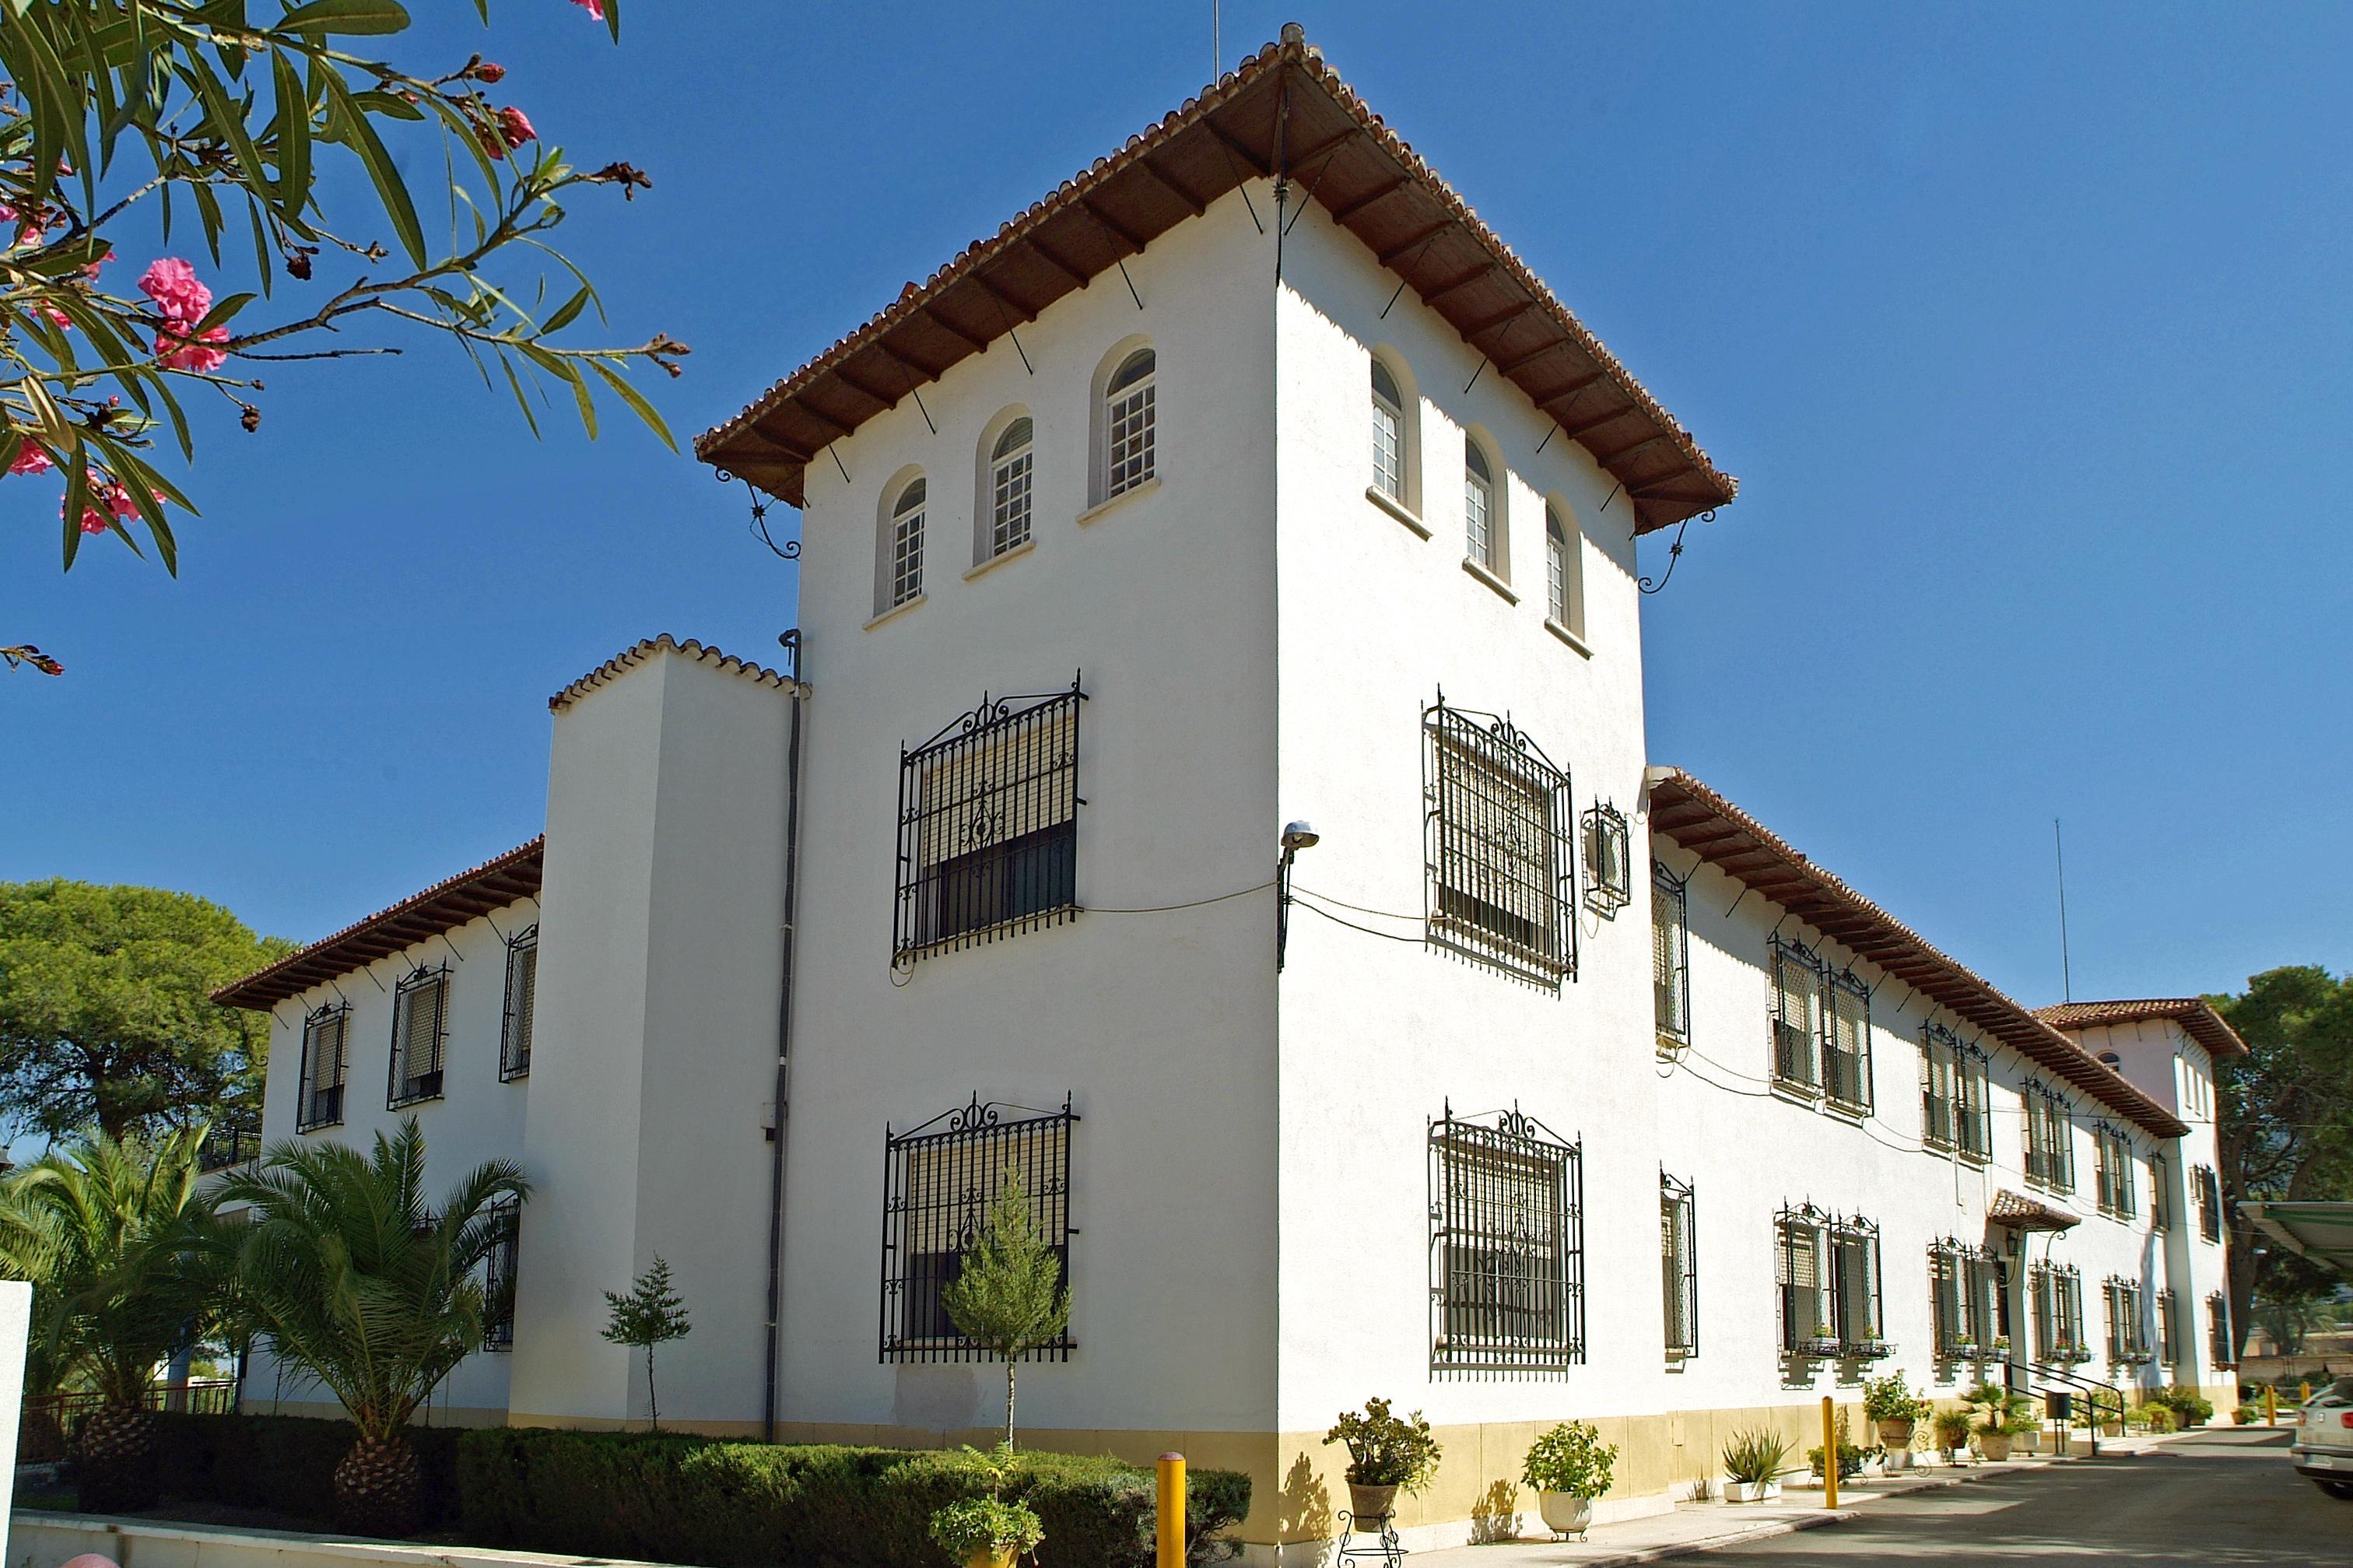 Exteriores clínica : Servicios de Sanatorio Doctor Muñoz